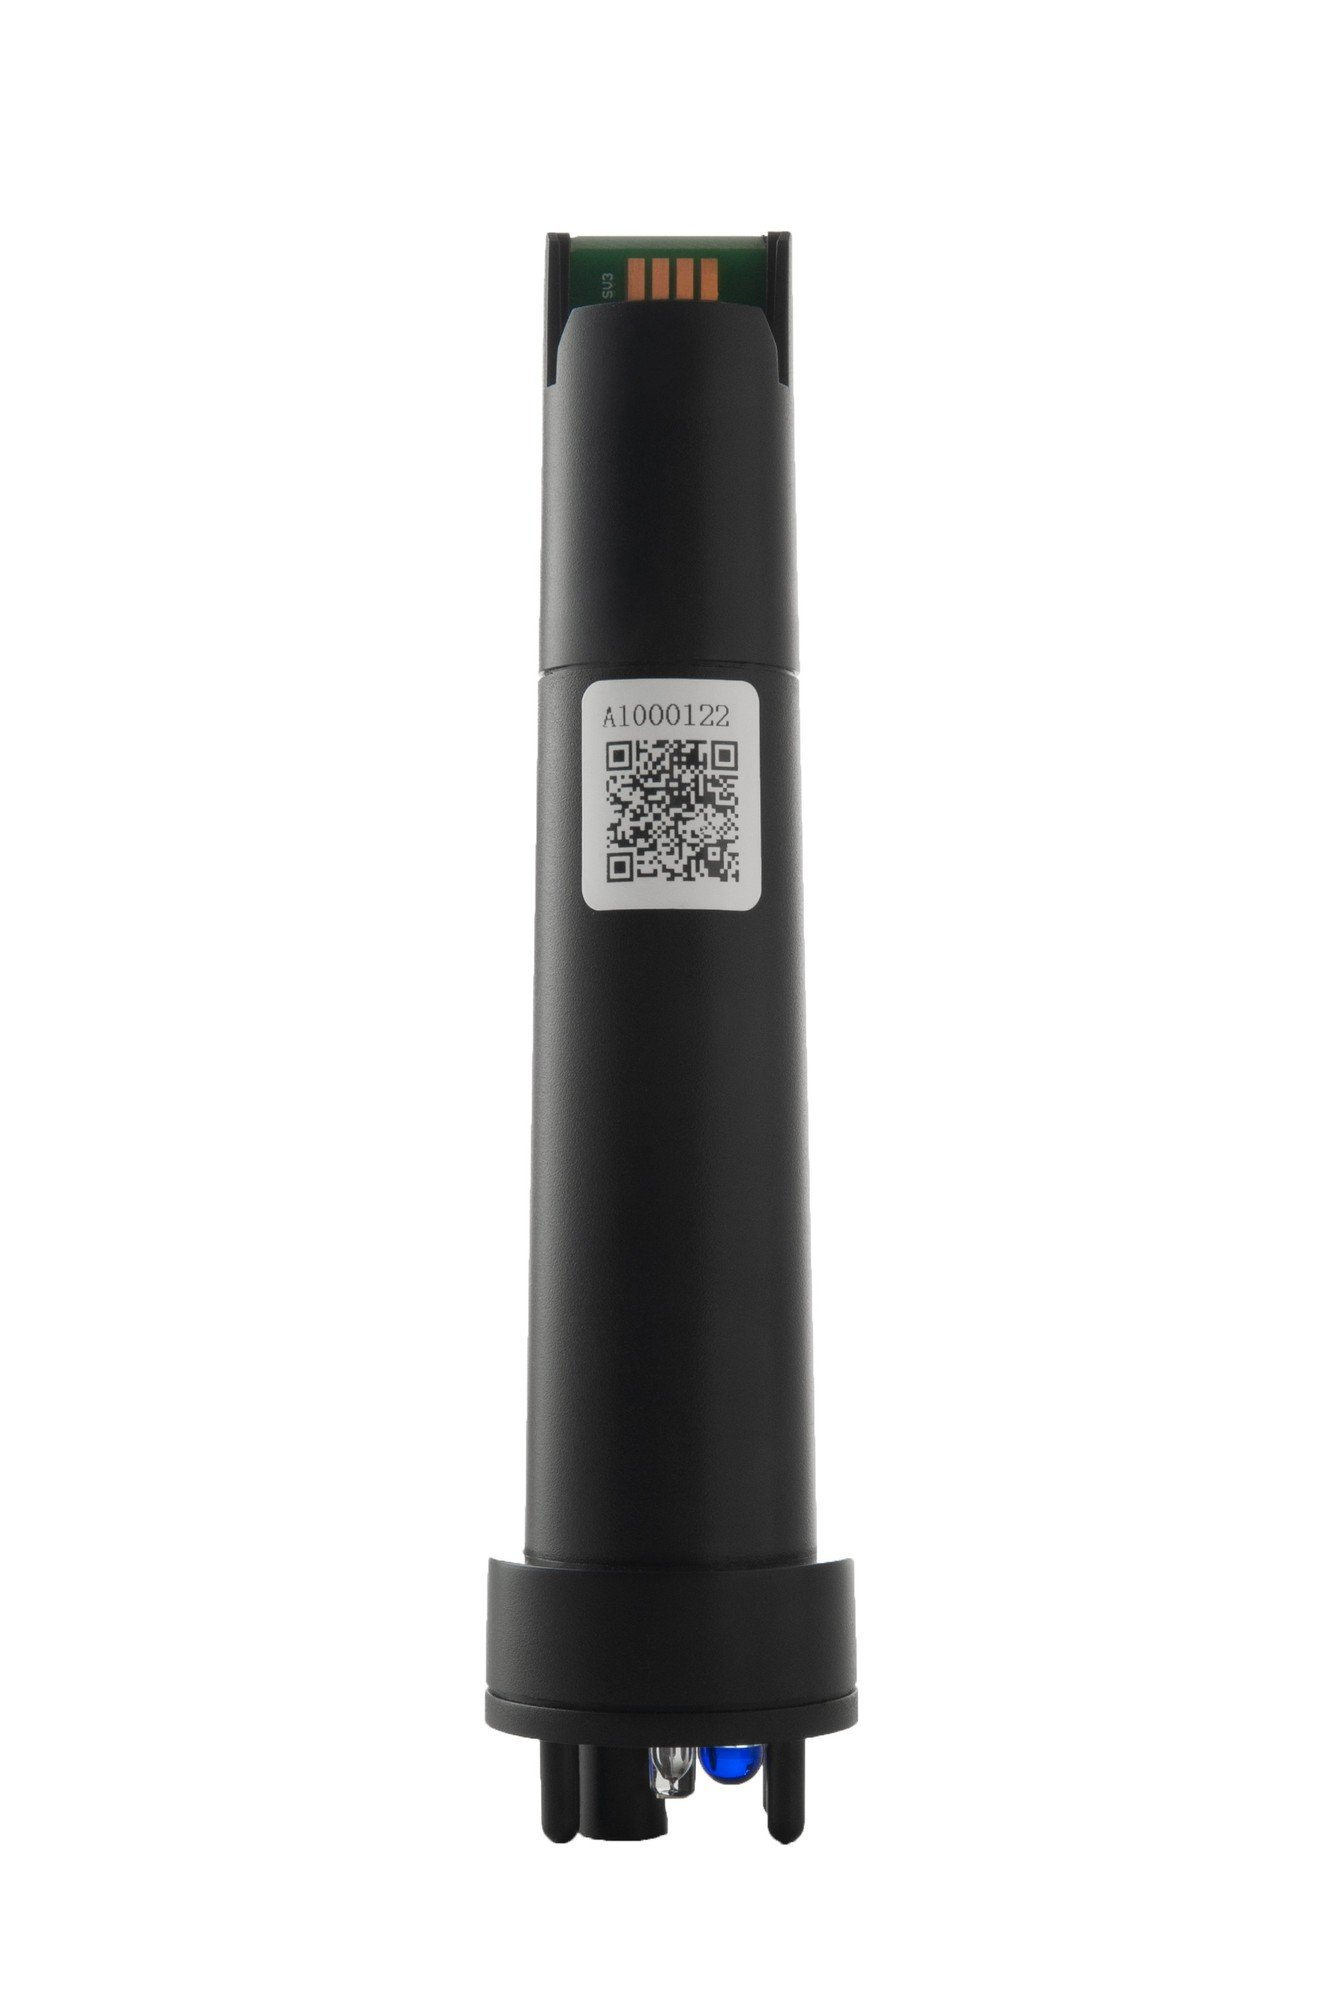 Afbeelding van 4-in-1 AU sensor voor Astral Blue Connect PLUS zout